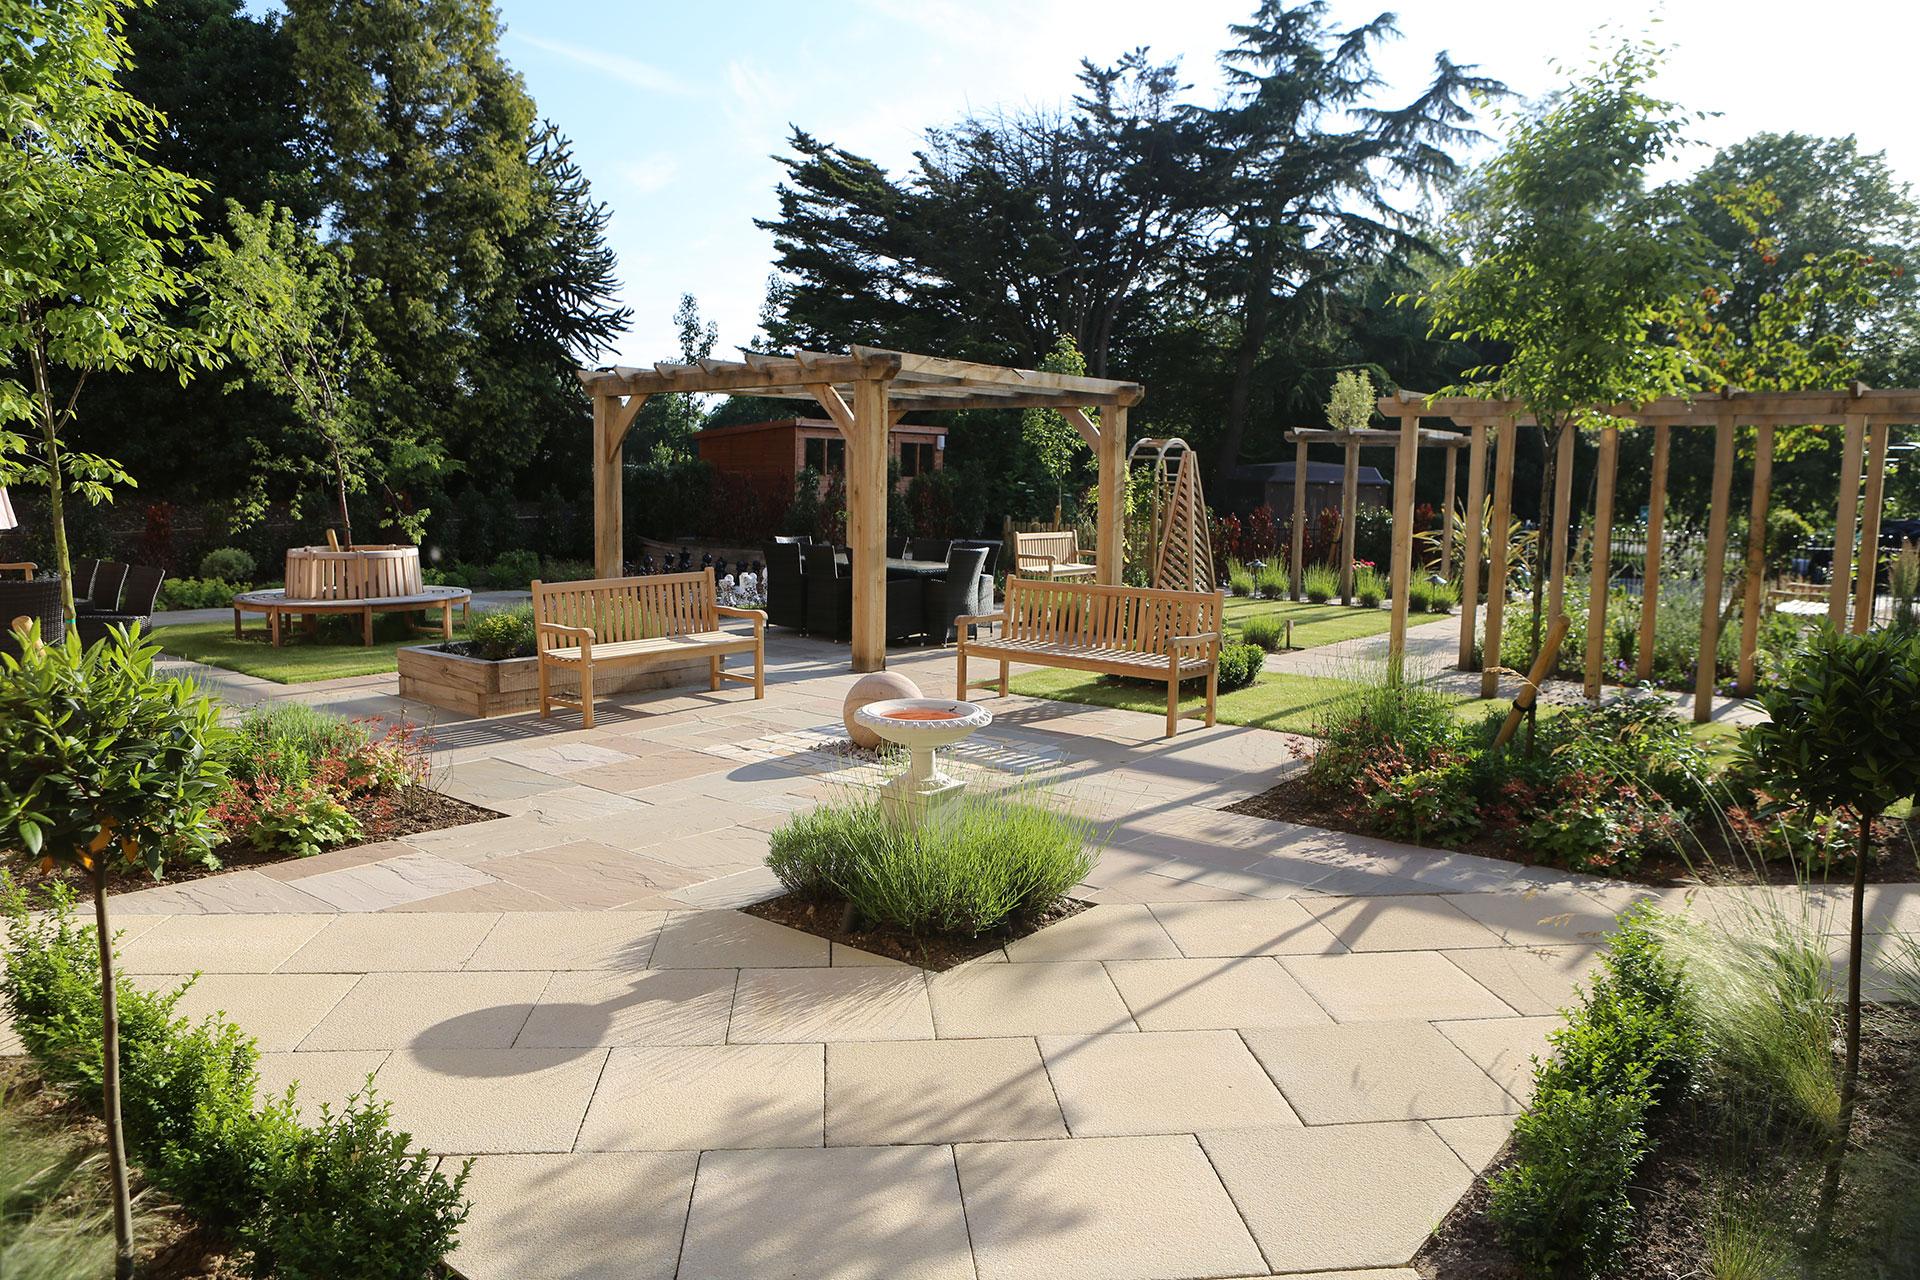 PARK VIEW CARE HOME IPSWICH | Aralia Garden Design ... on Home Backyard Ideas  id=64150